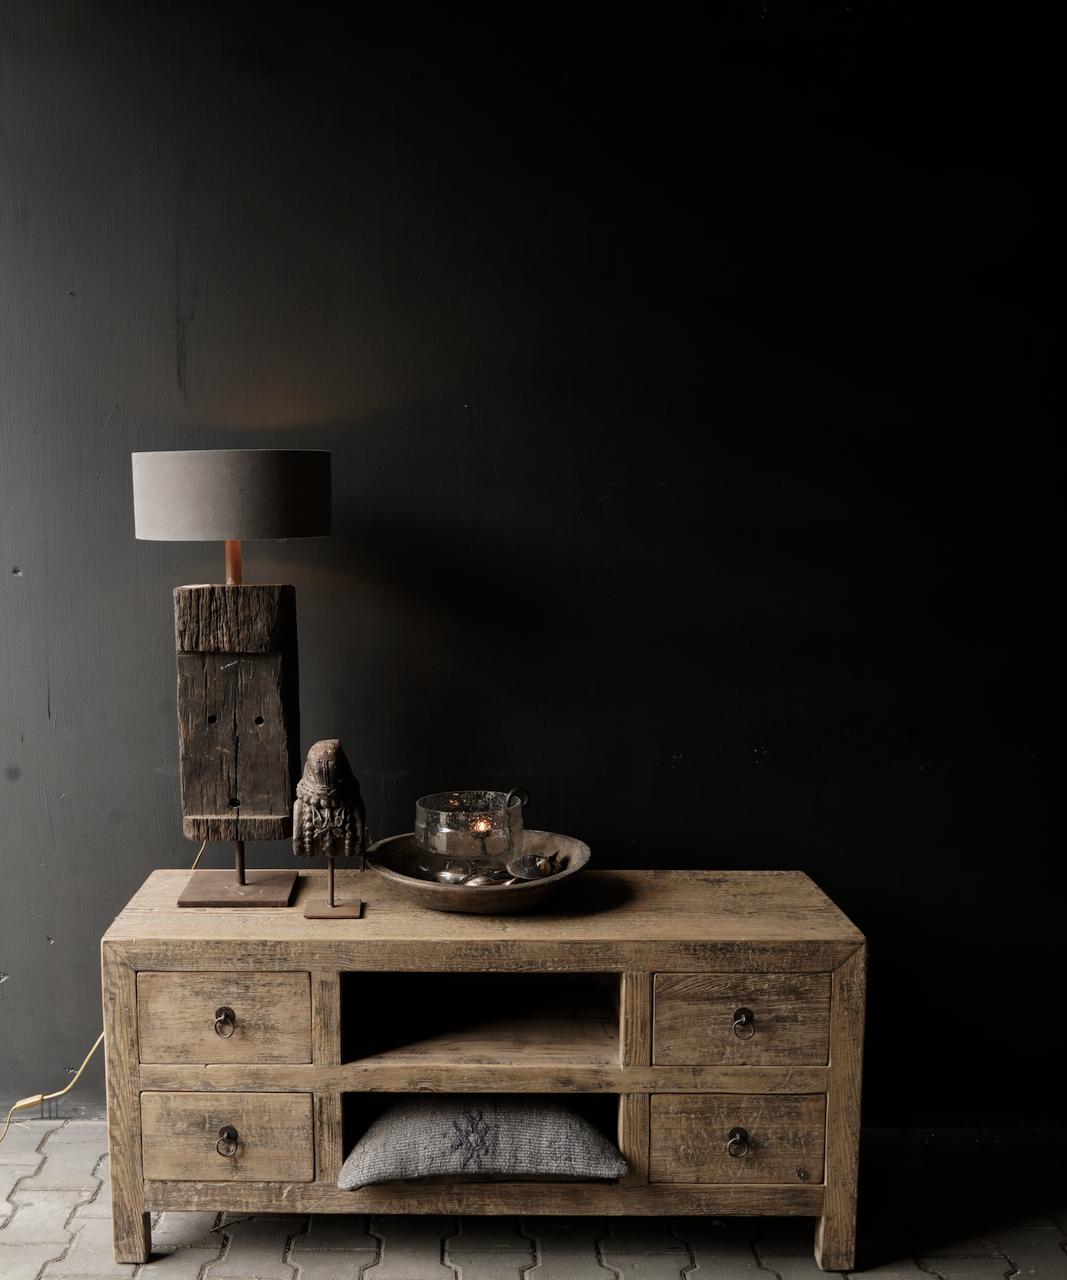 TV-Möbel / Sideboard aus dem alten Elmwood-1